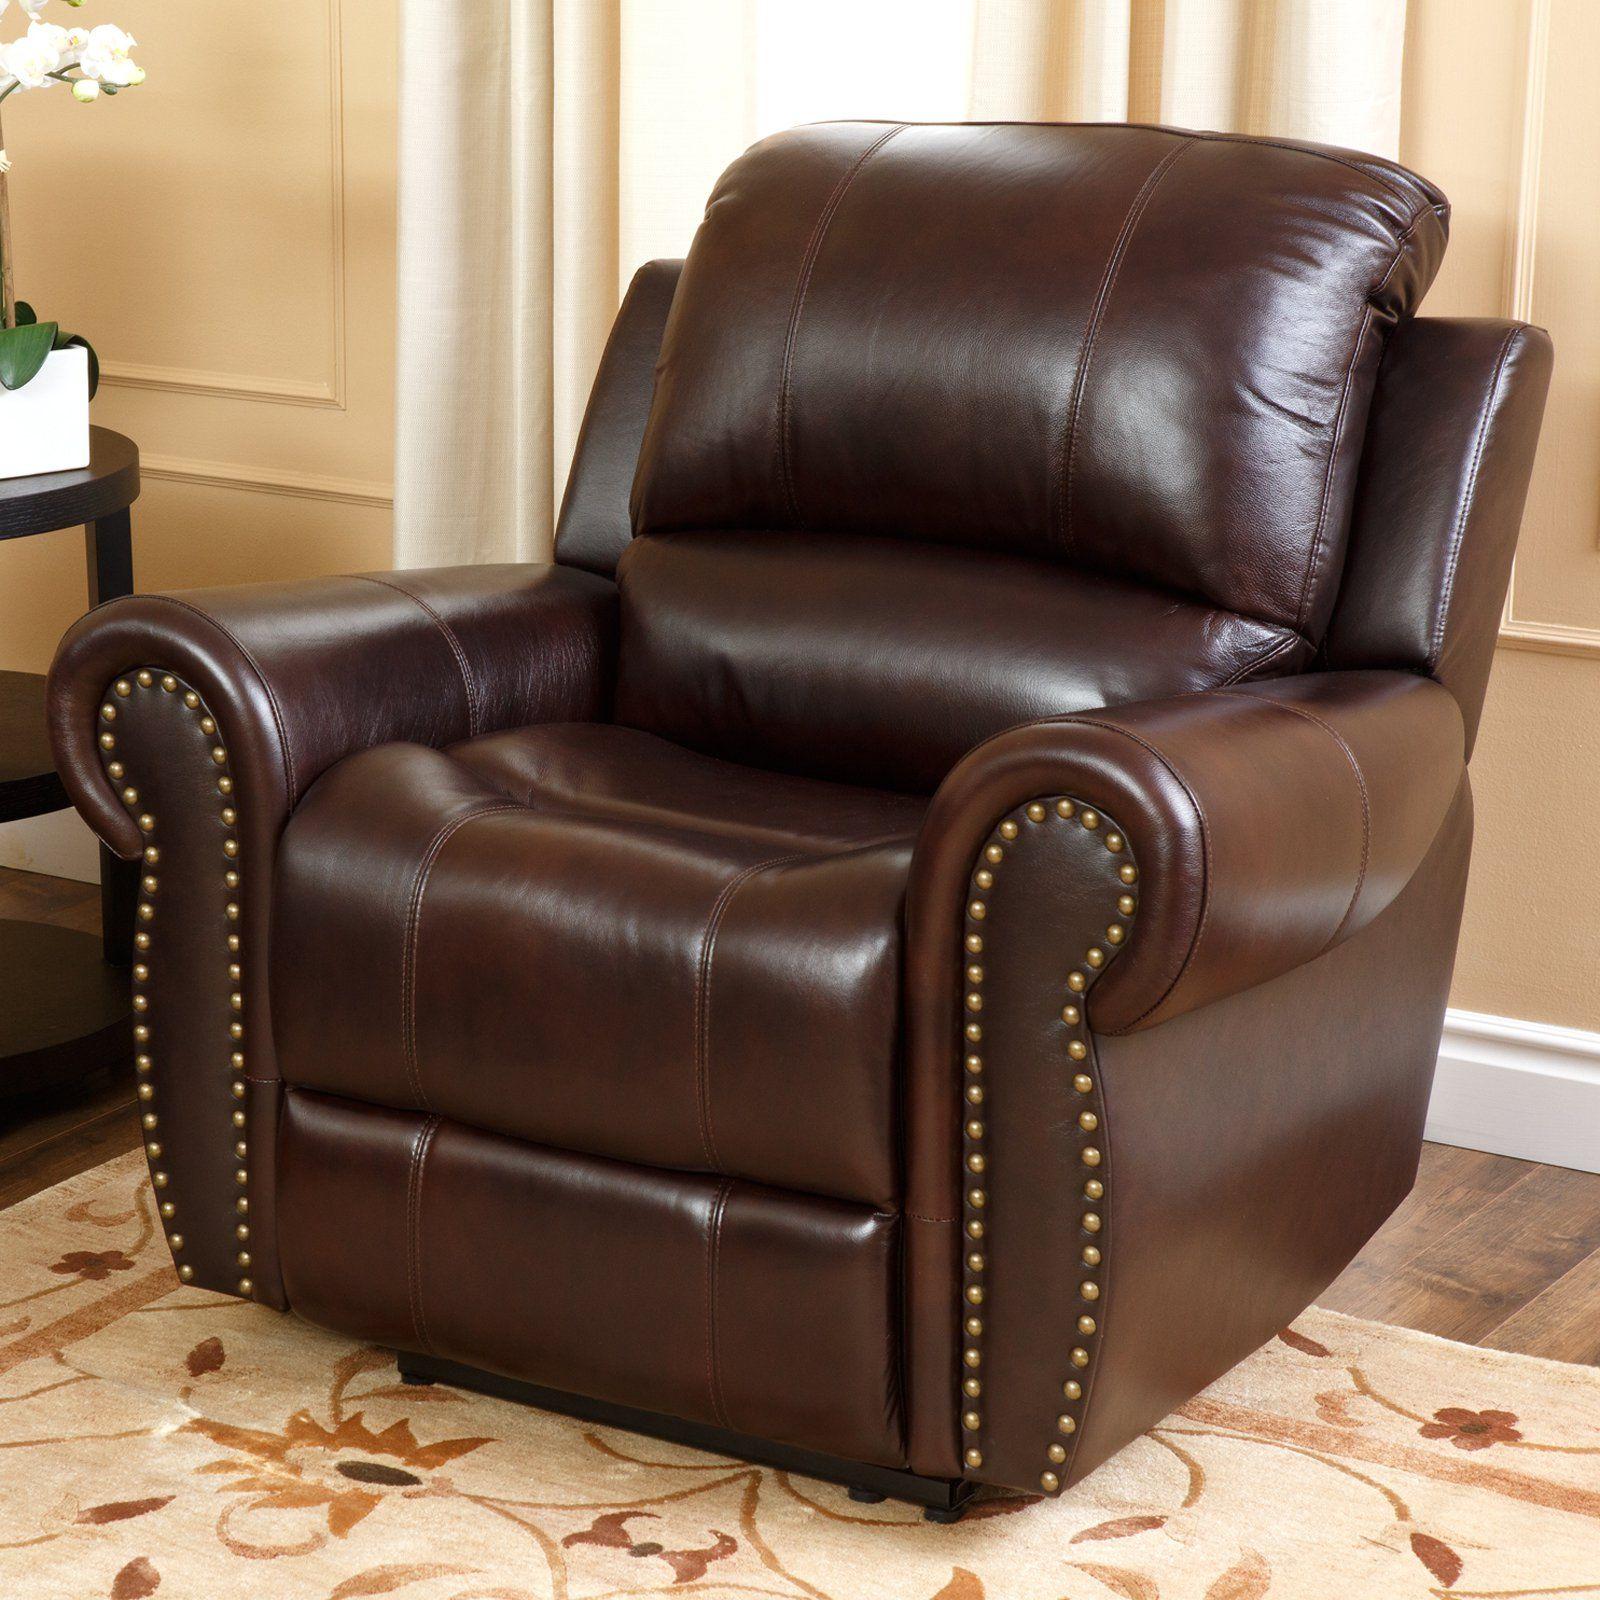 Abbyson Living Lexington Italian Leather Reclining Chair With Nailheads 994 95 Hayneedle